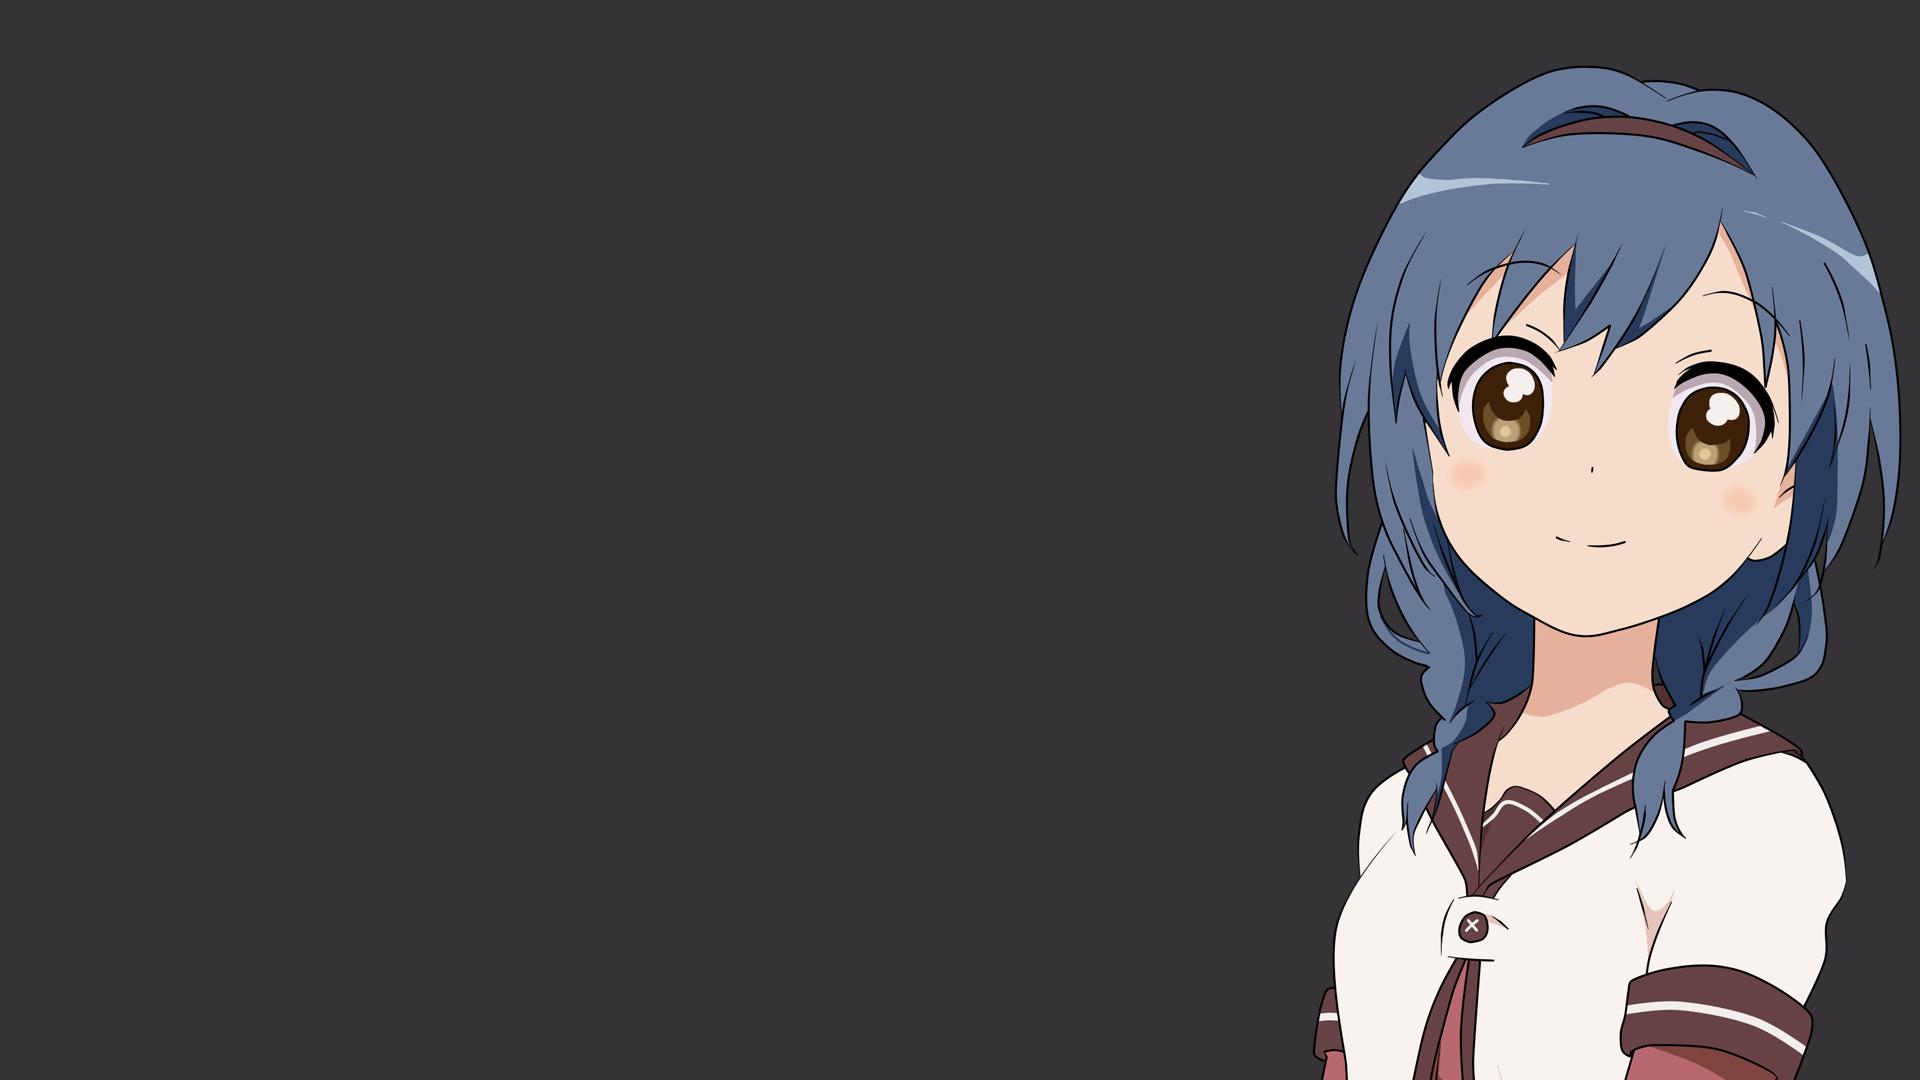 Anime Cute Girl Hoodie Wallpaper 1080p 173 Yuru Yuri Hd Wallpapers Background Images